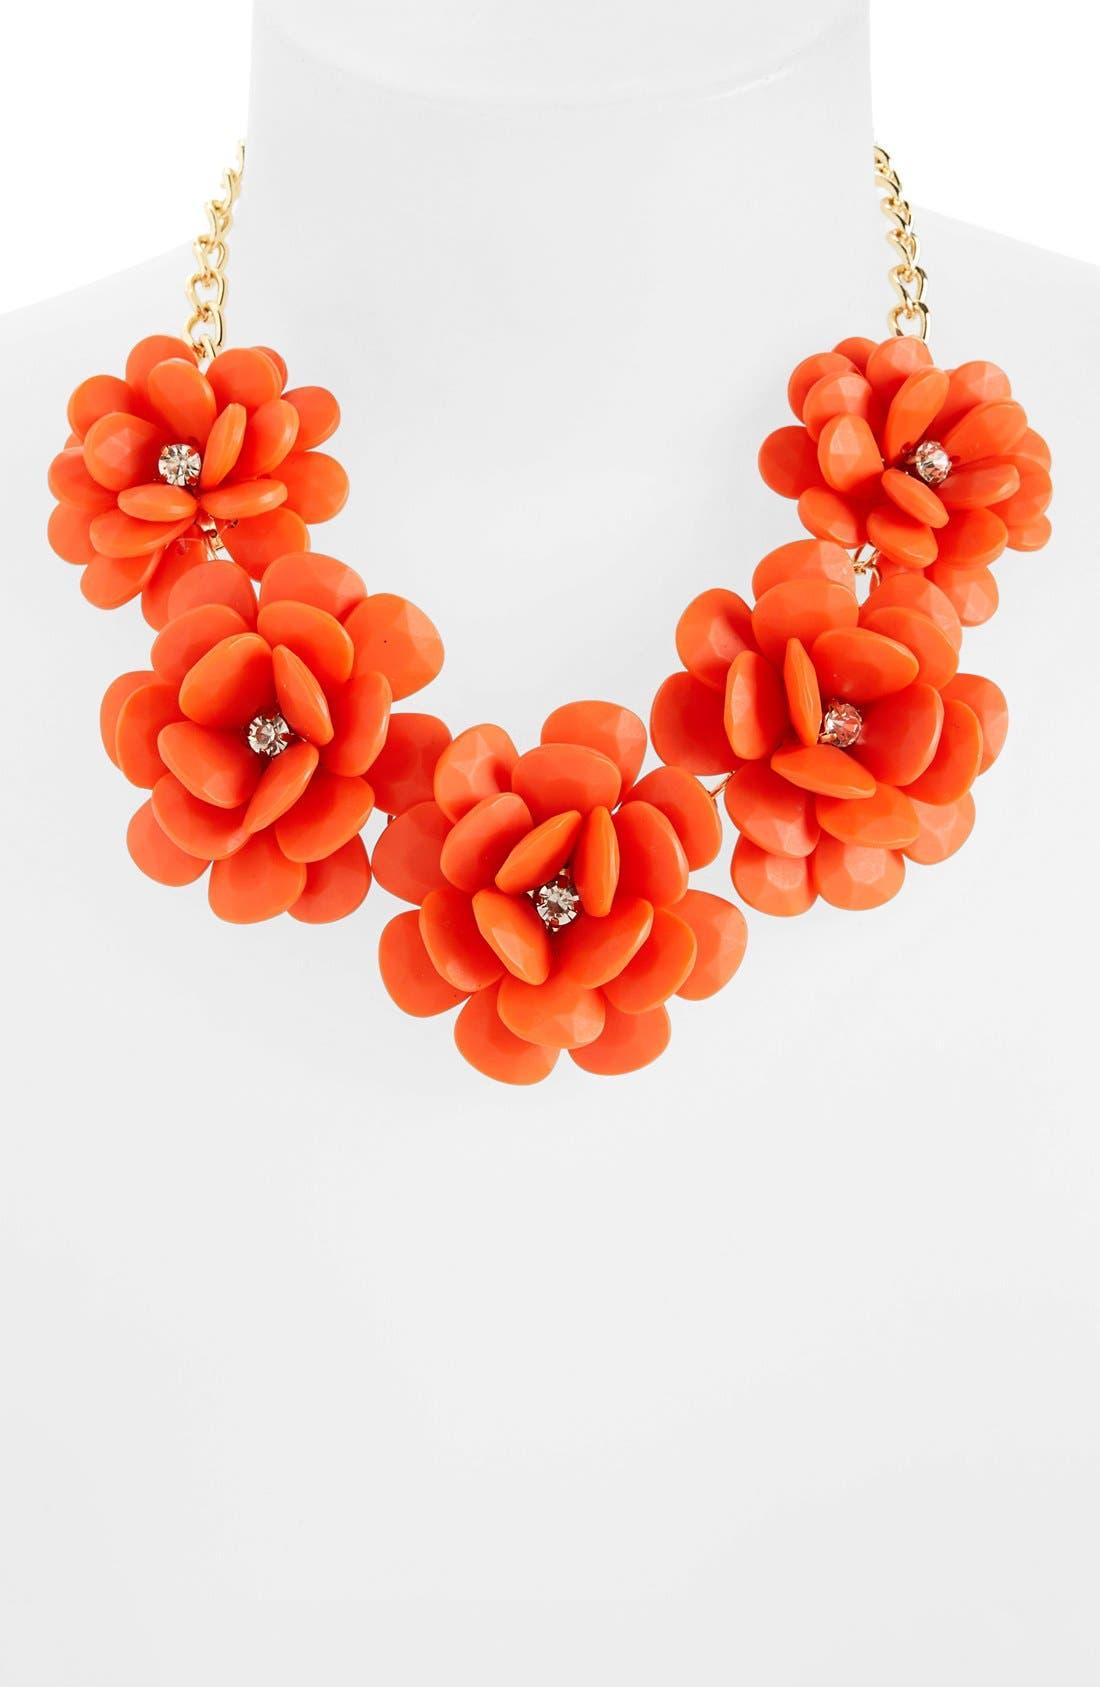 Alternate Image 1 Selected - Topshop Large Coral Flower Necklace